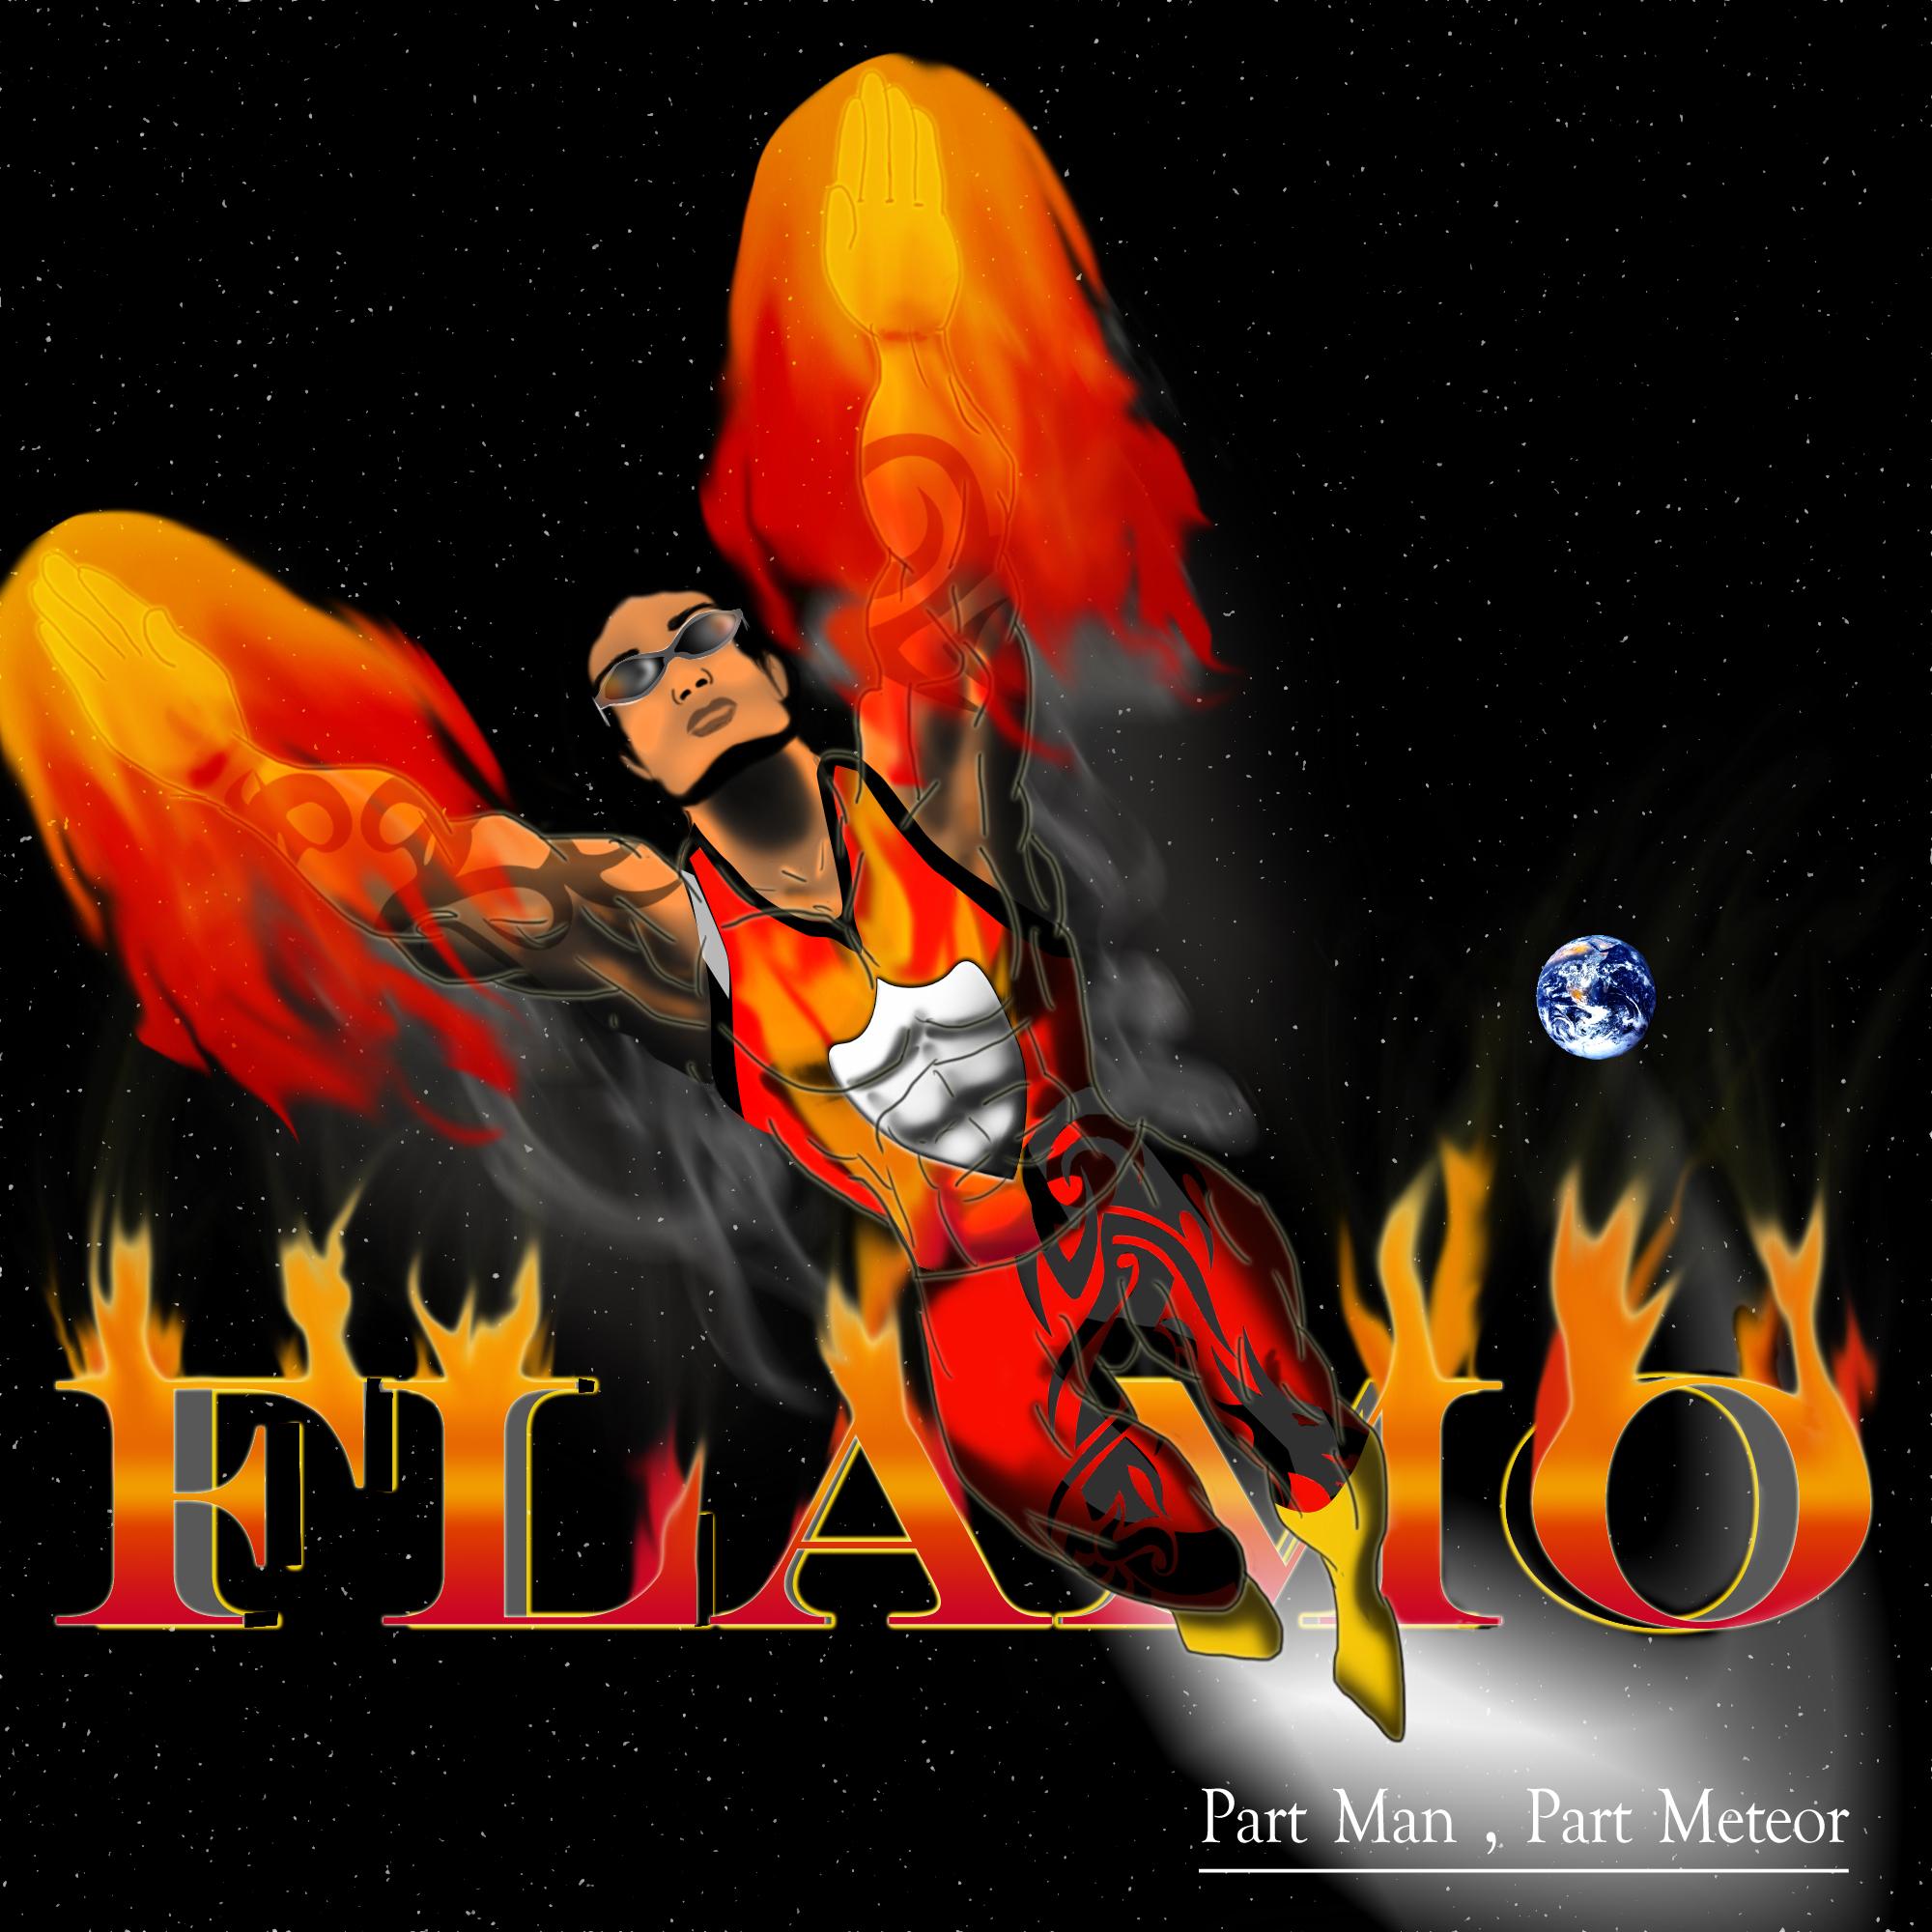 Flamo